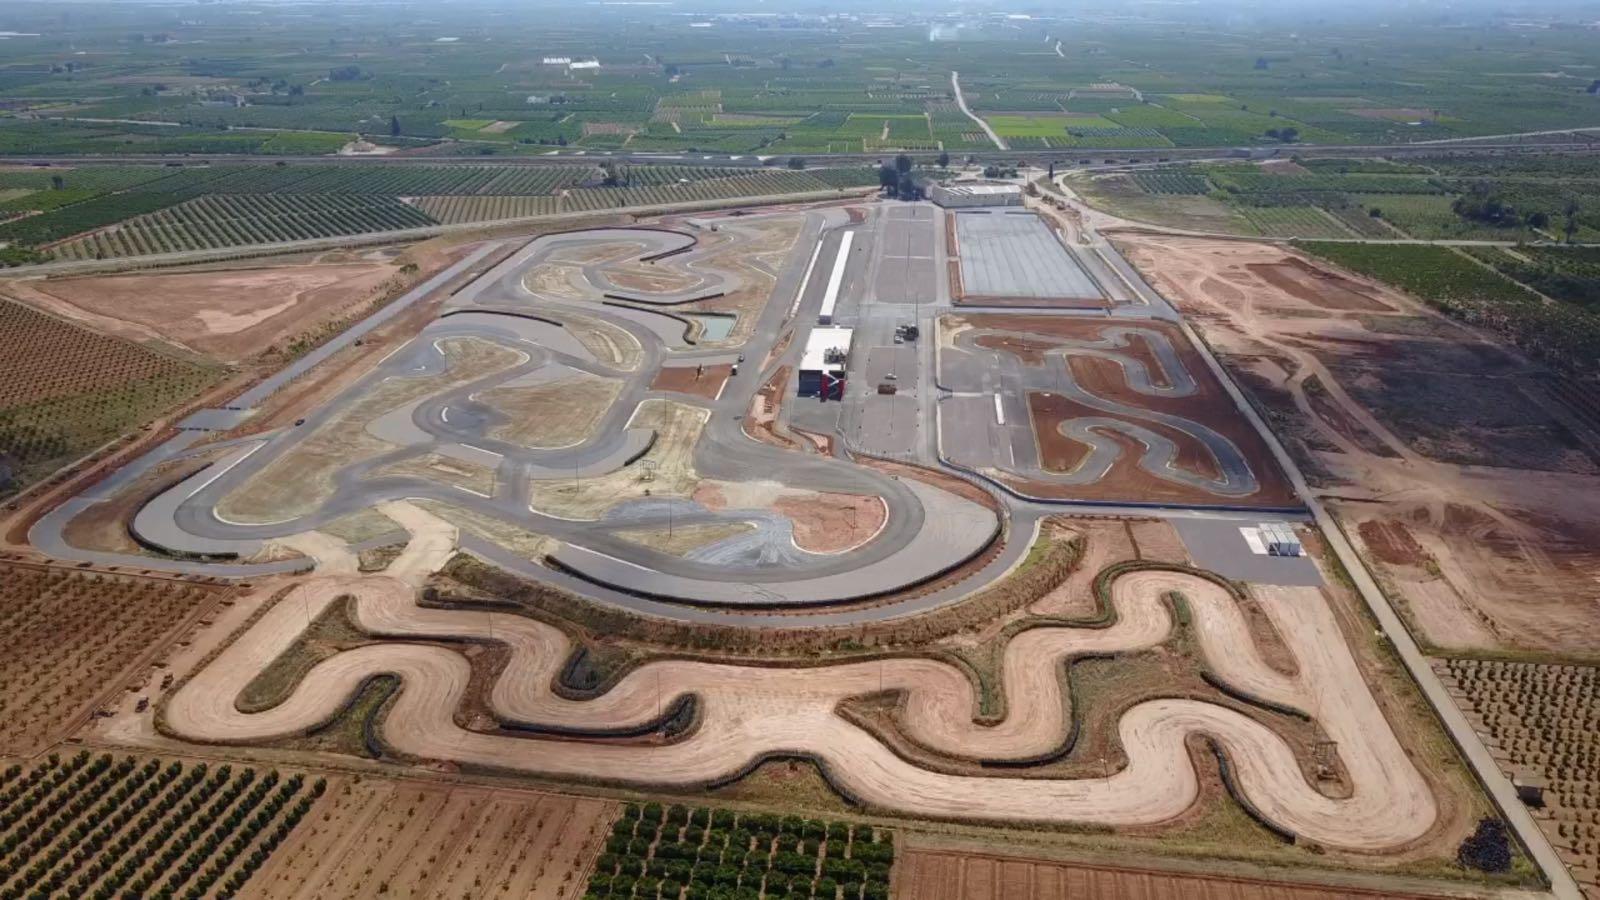 Circuito La Ribera : Elmaletero o motor ciencia ficcion manga cultura